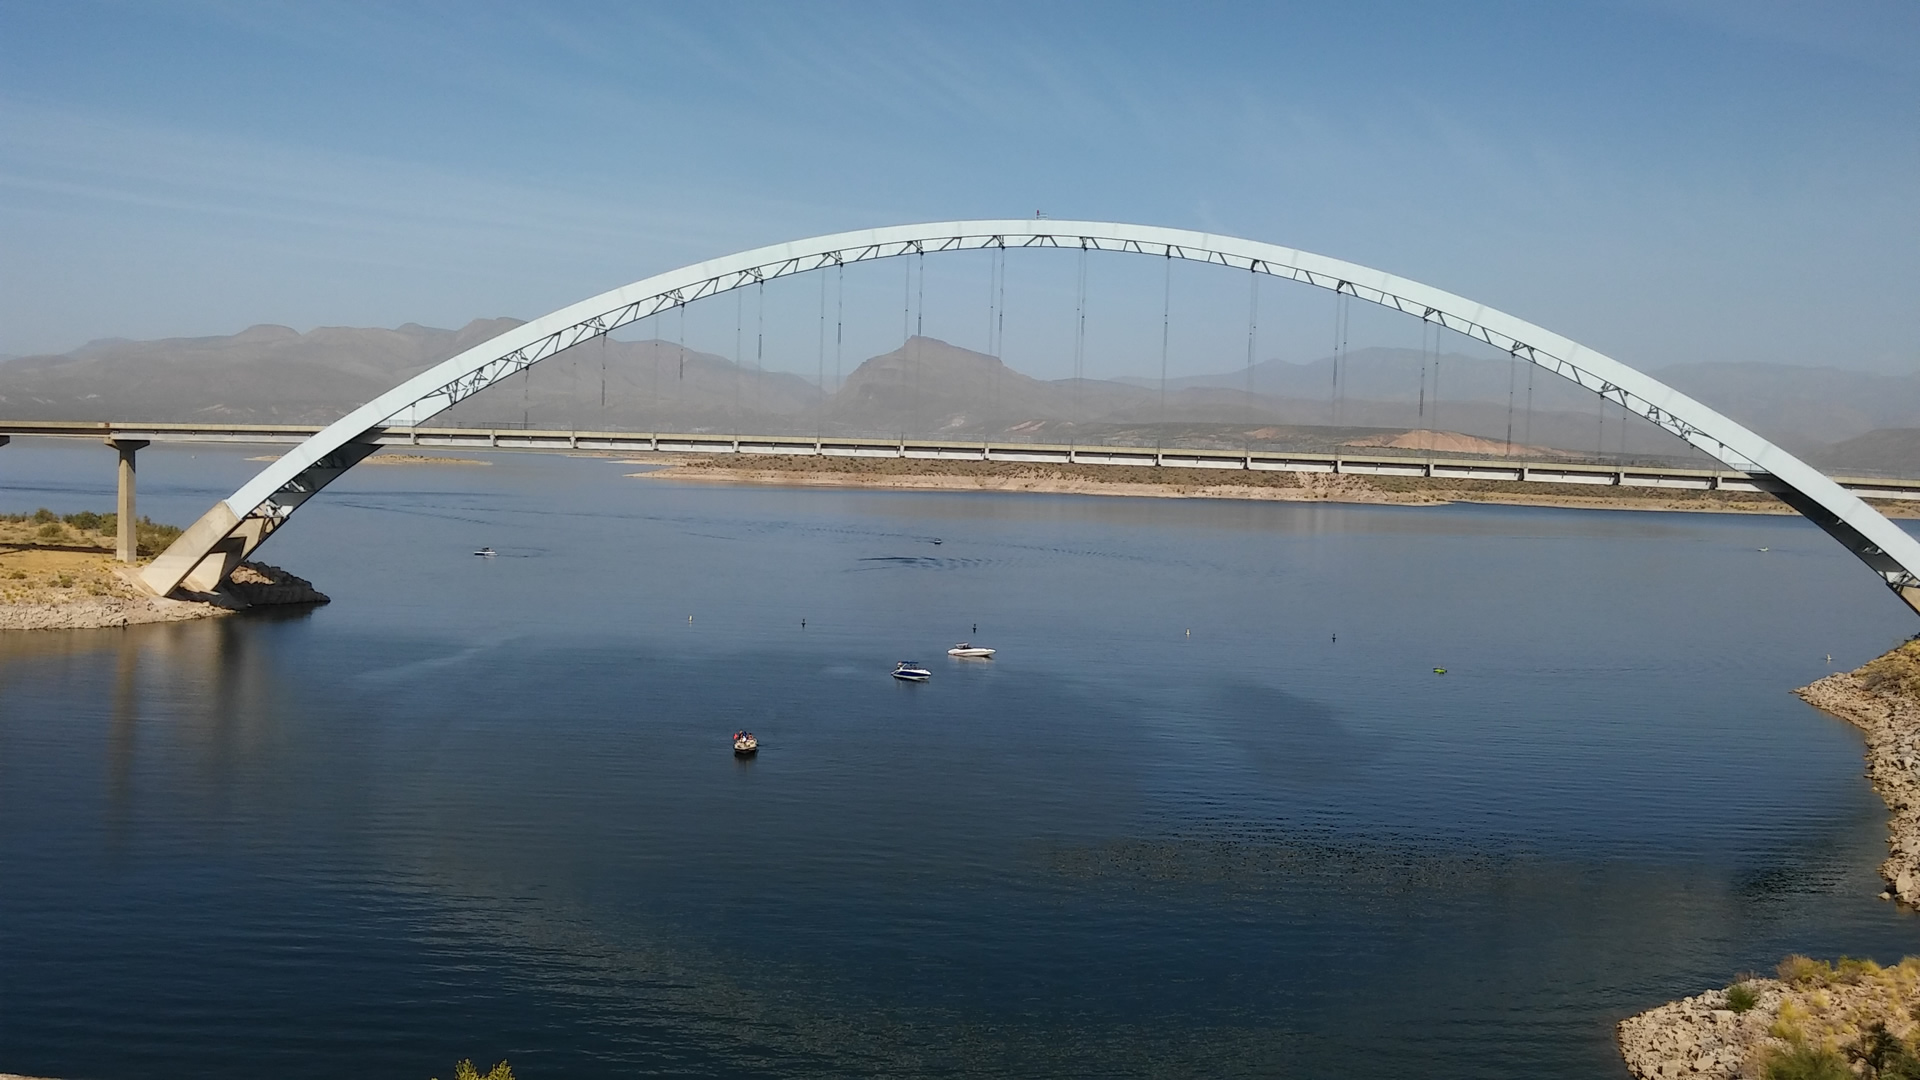 bridge-in-arizona-ride-2018